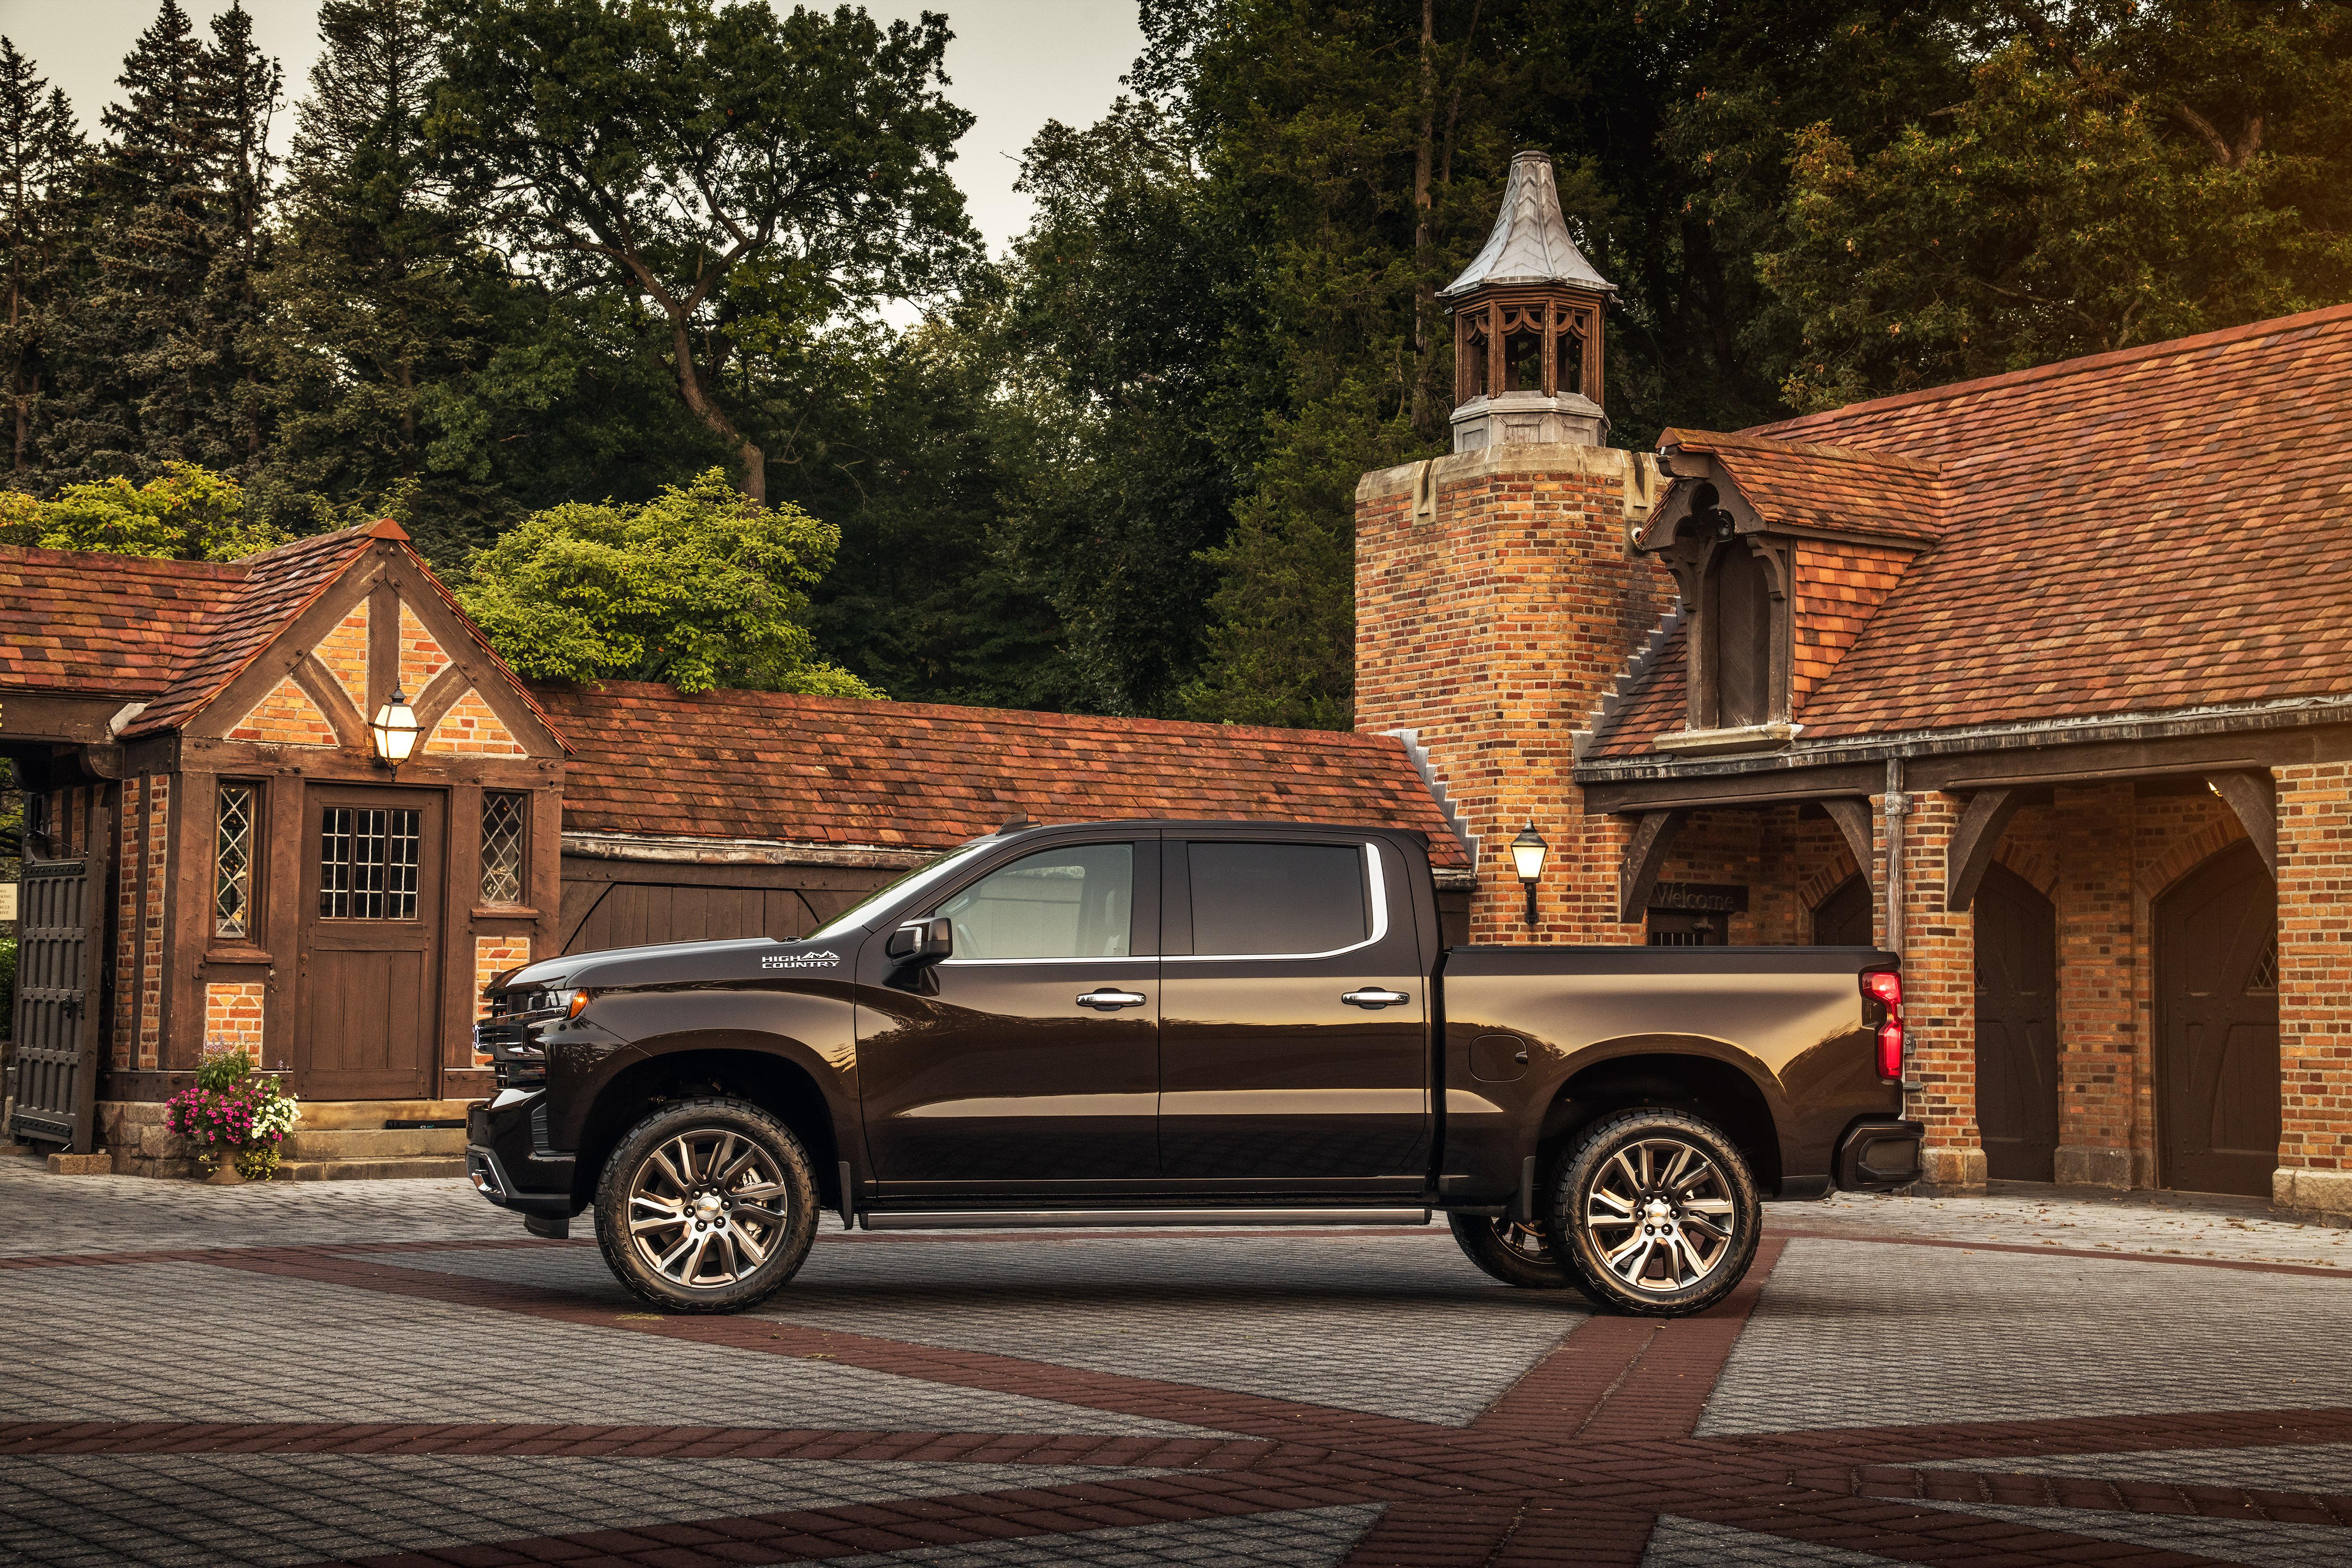 Kelebihan Kekurangan Chevrolet High Country 2019 Harga